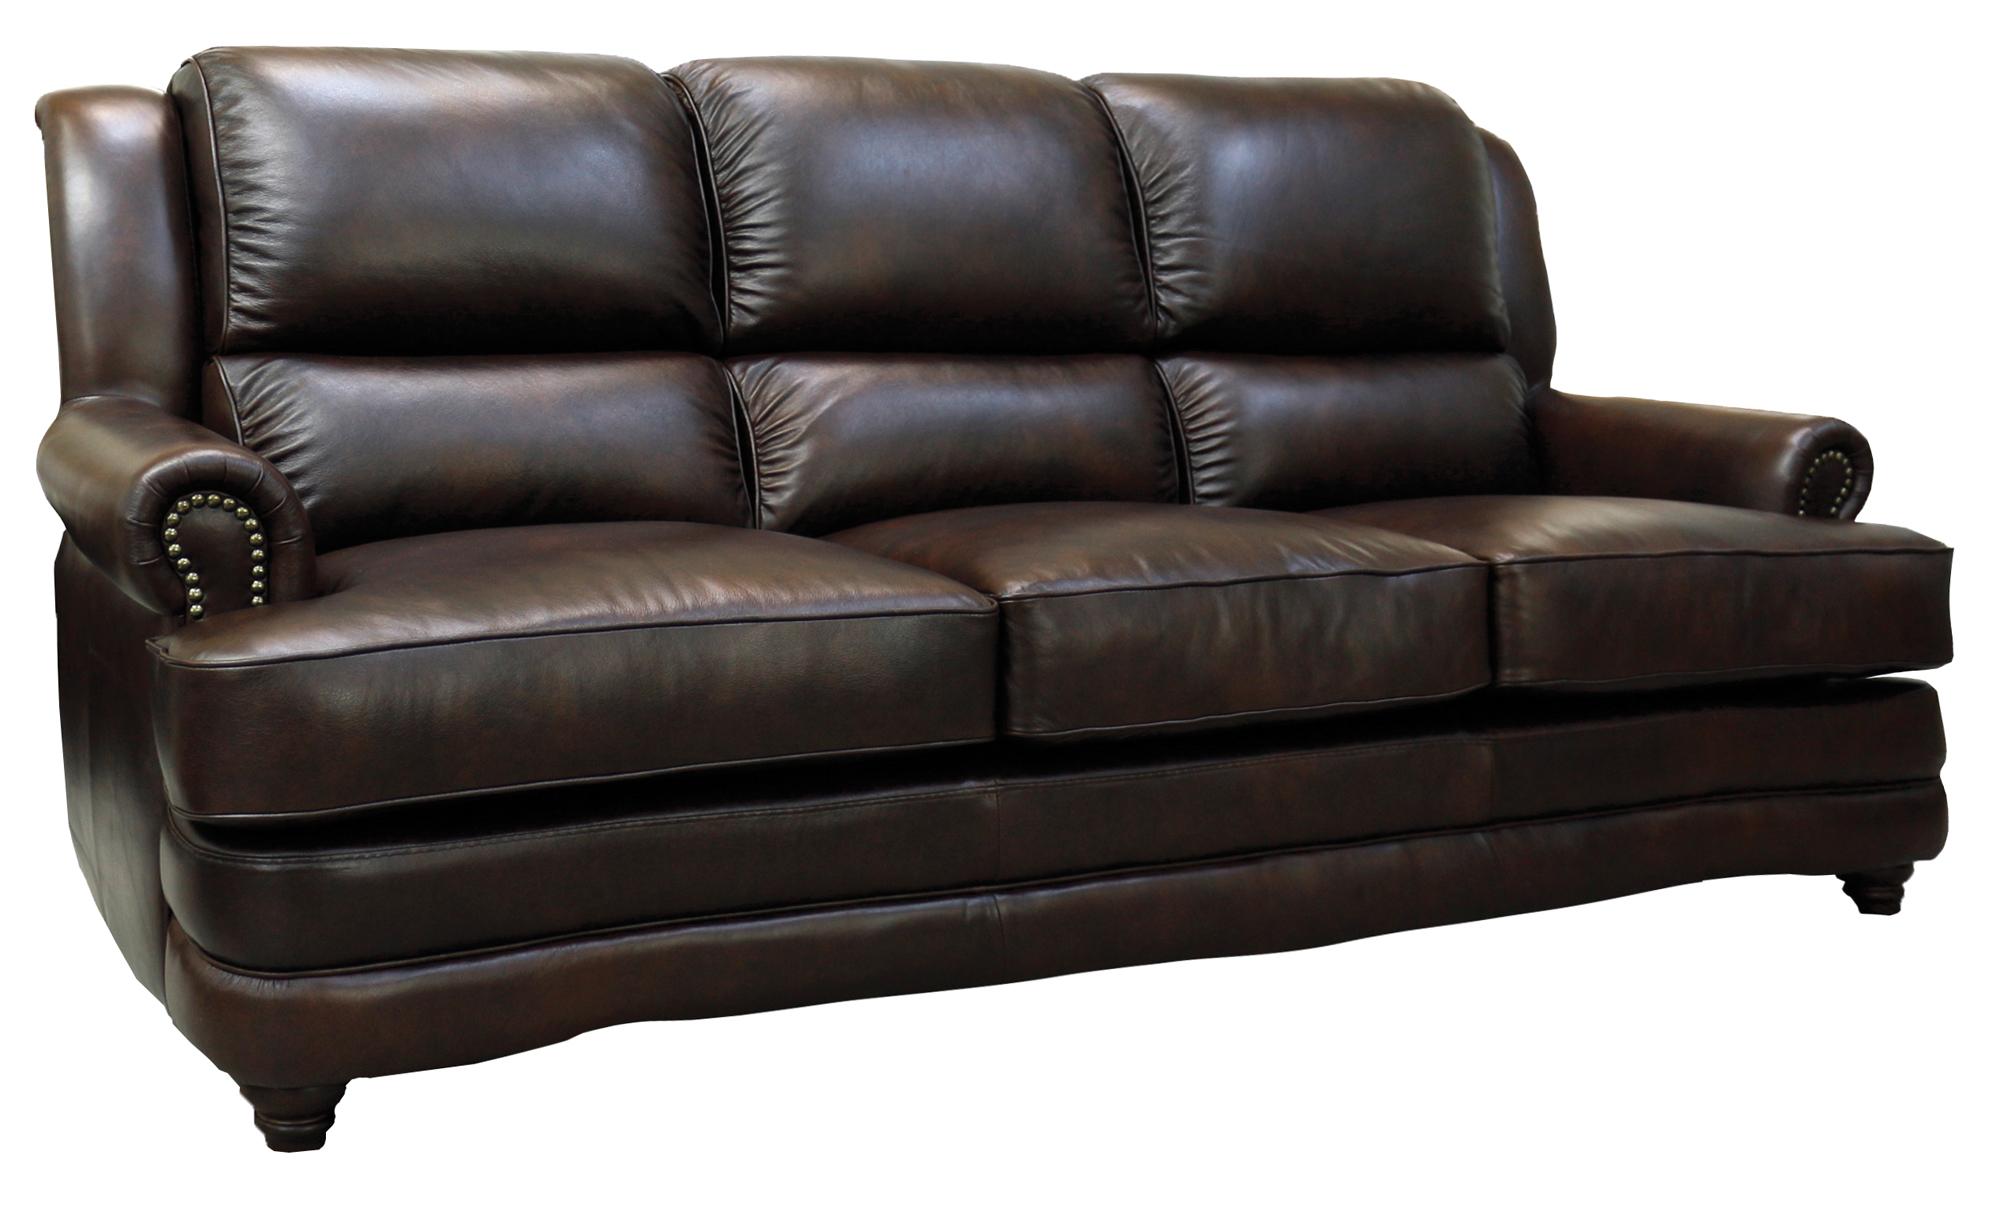 and ideas size set sofas image blue all zuri large black inspirations new bentley century sofa amazingodern sofar amazing modern of contemporary furniture living mid design room leather